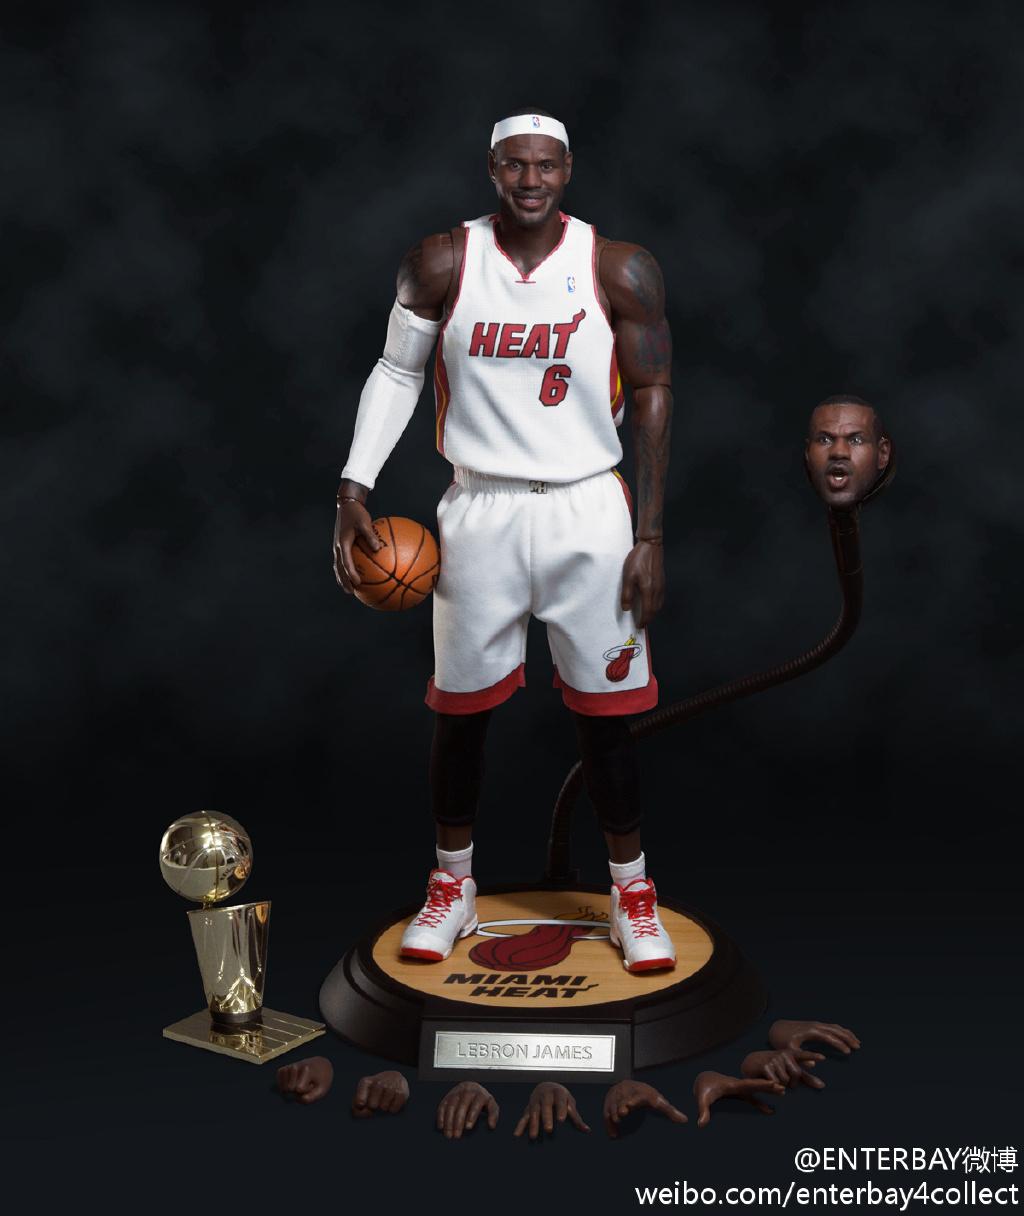 [Enterbay] NBA Real Masterpiece - LeBron James - Página 3 685ebd96jw1e5vzip97sdj20xc13l7c8